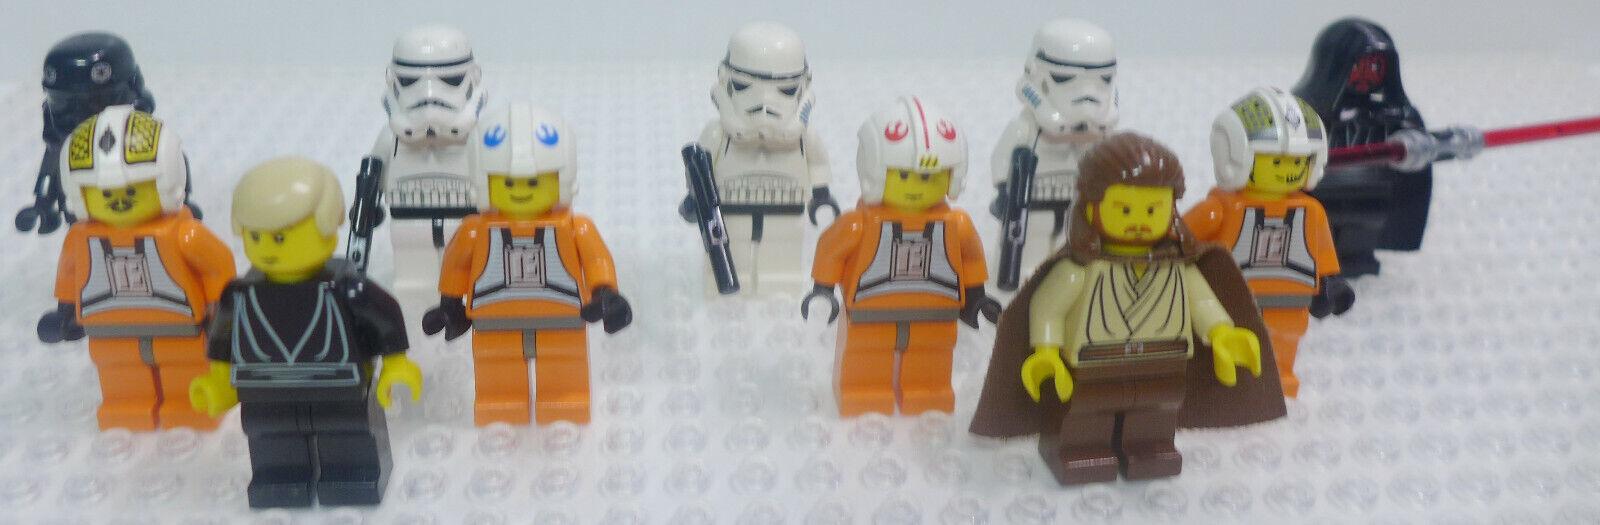 (11) estrella guerras  Minicifras  Luke cielowalker, Dak Ralter, Storm Troopers, greegs ++  prima i clienti